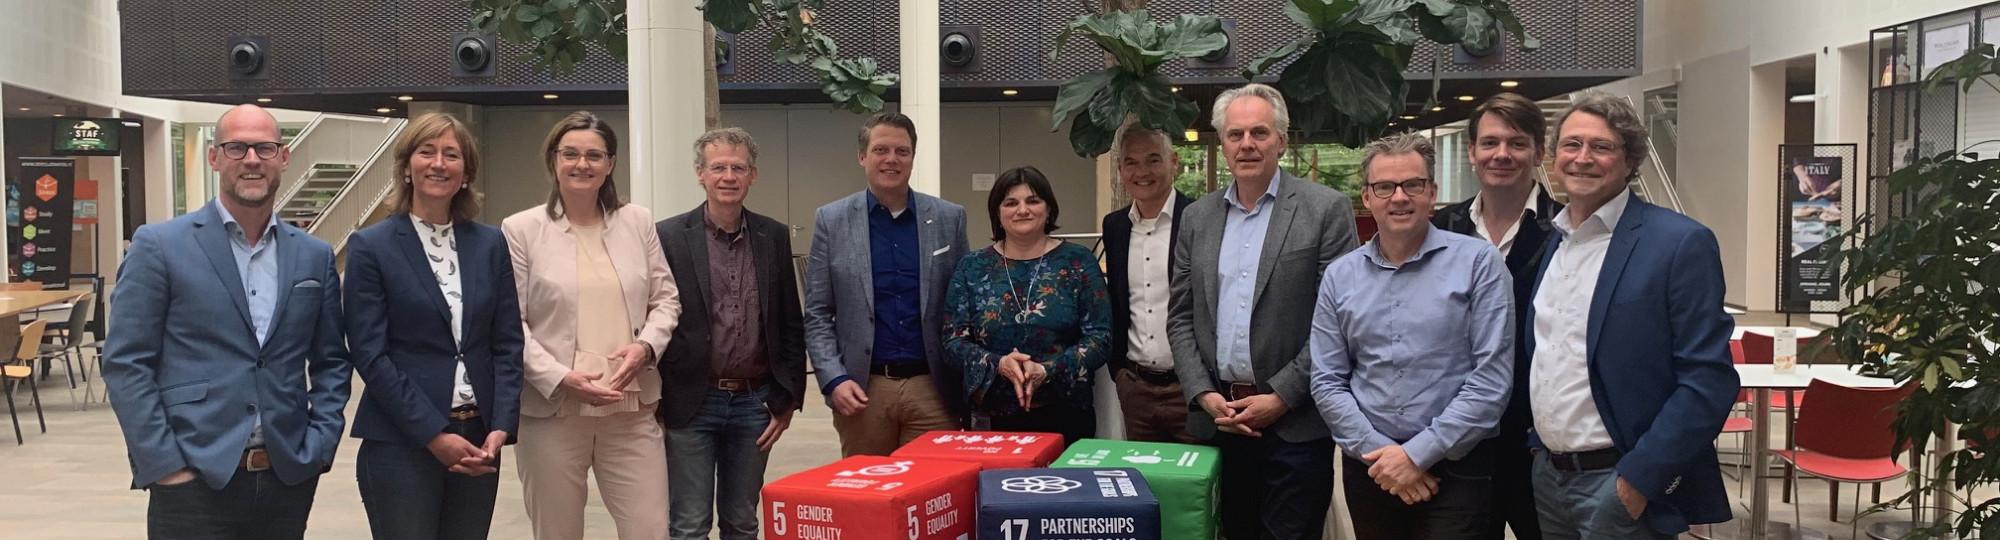 University of Twente and Emons Group